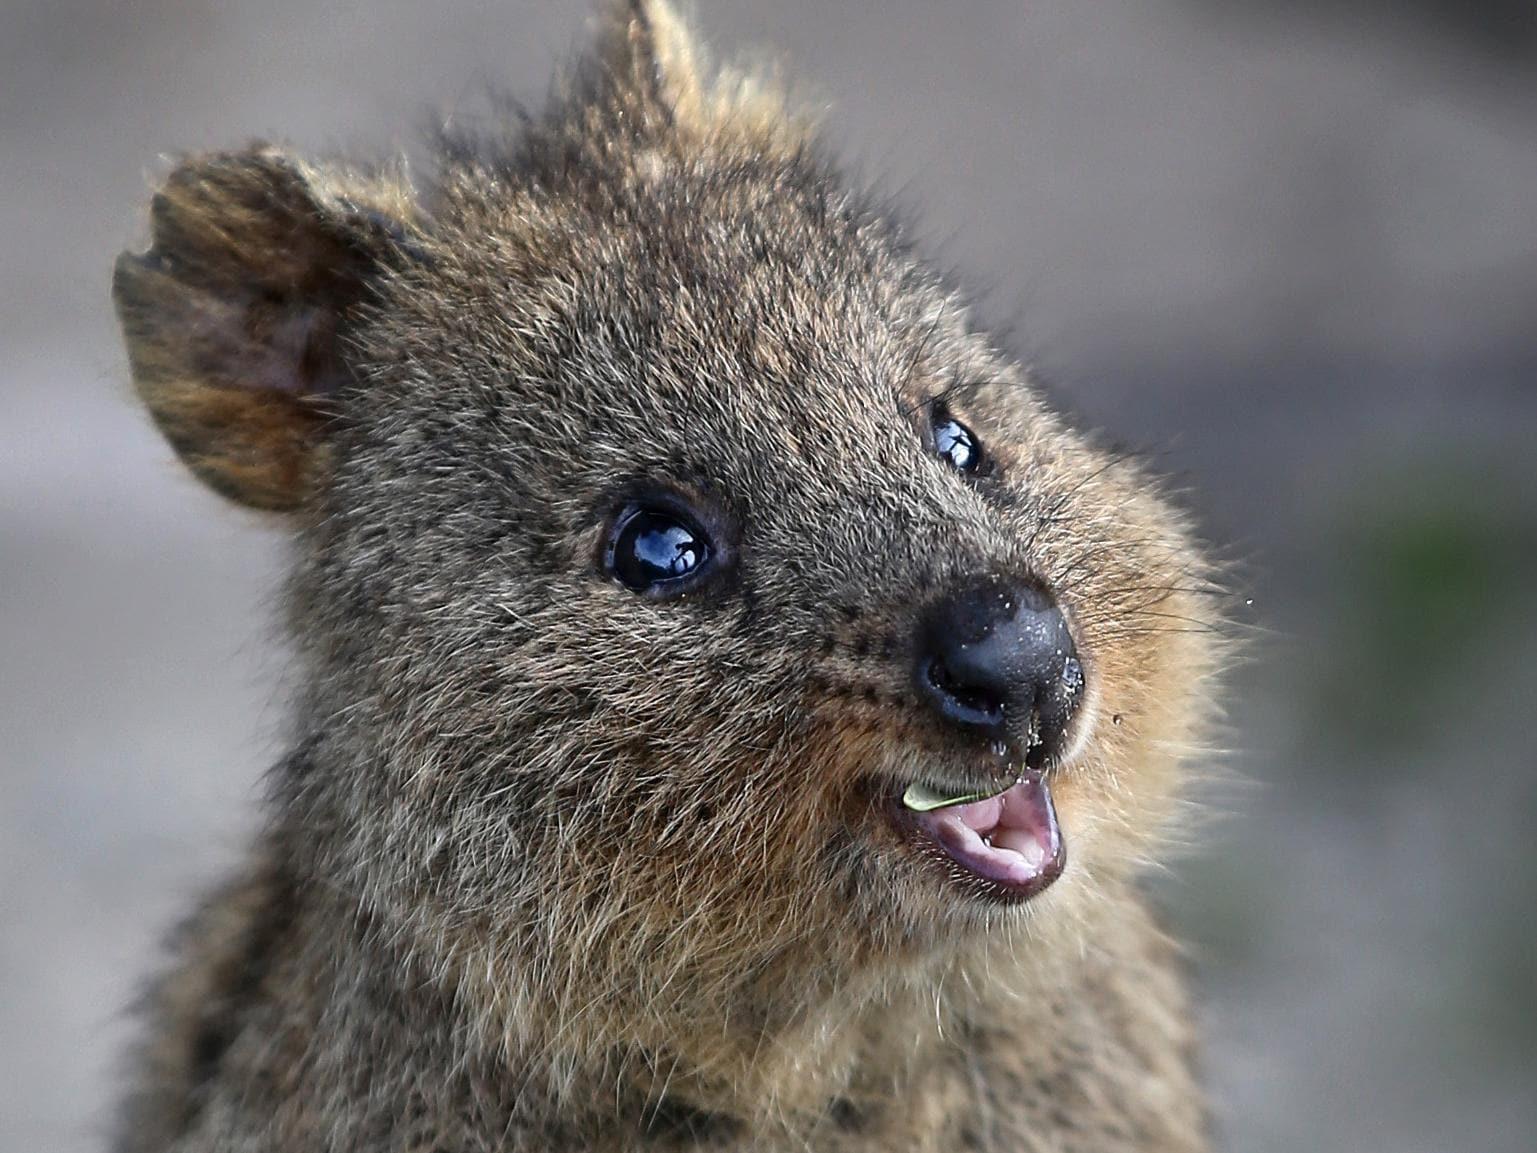 Instagram compares quokka selfies to animal cruelty